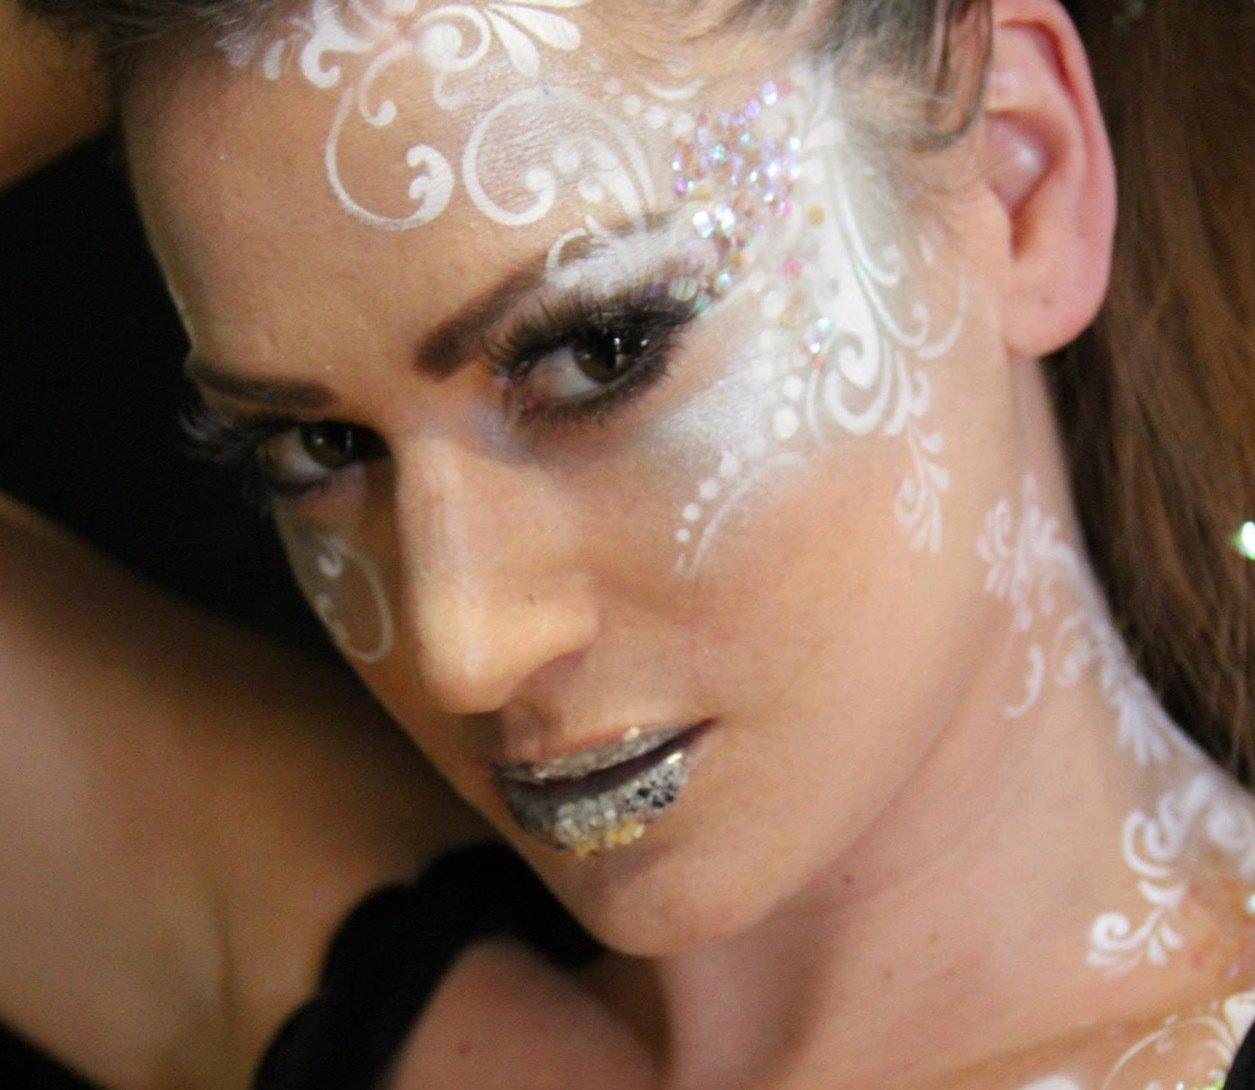 4hr Event/ Ibiza Wedding face & bodyart sevice £545